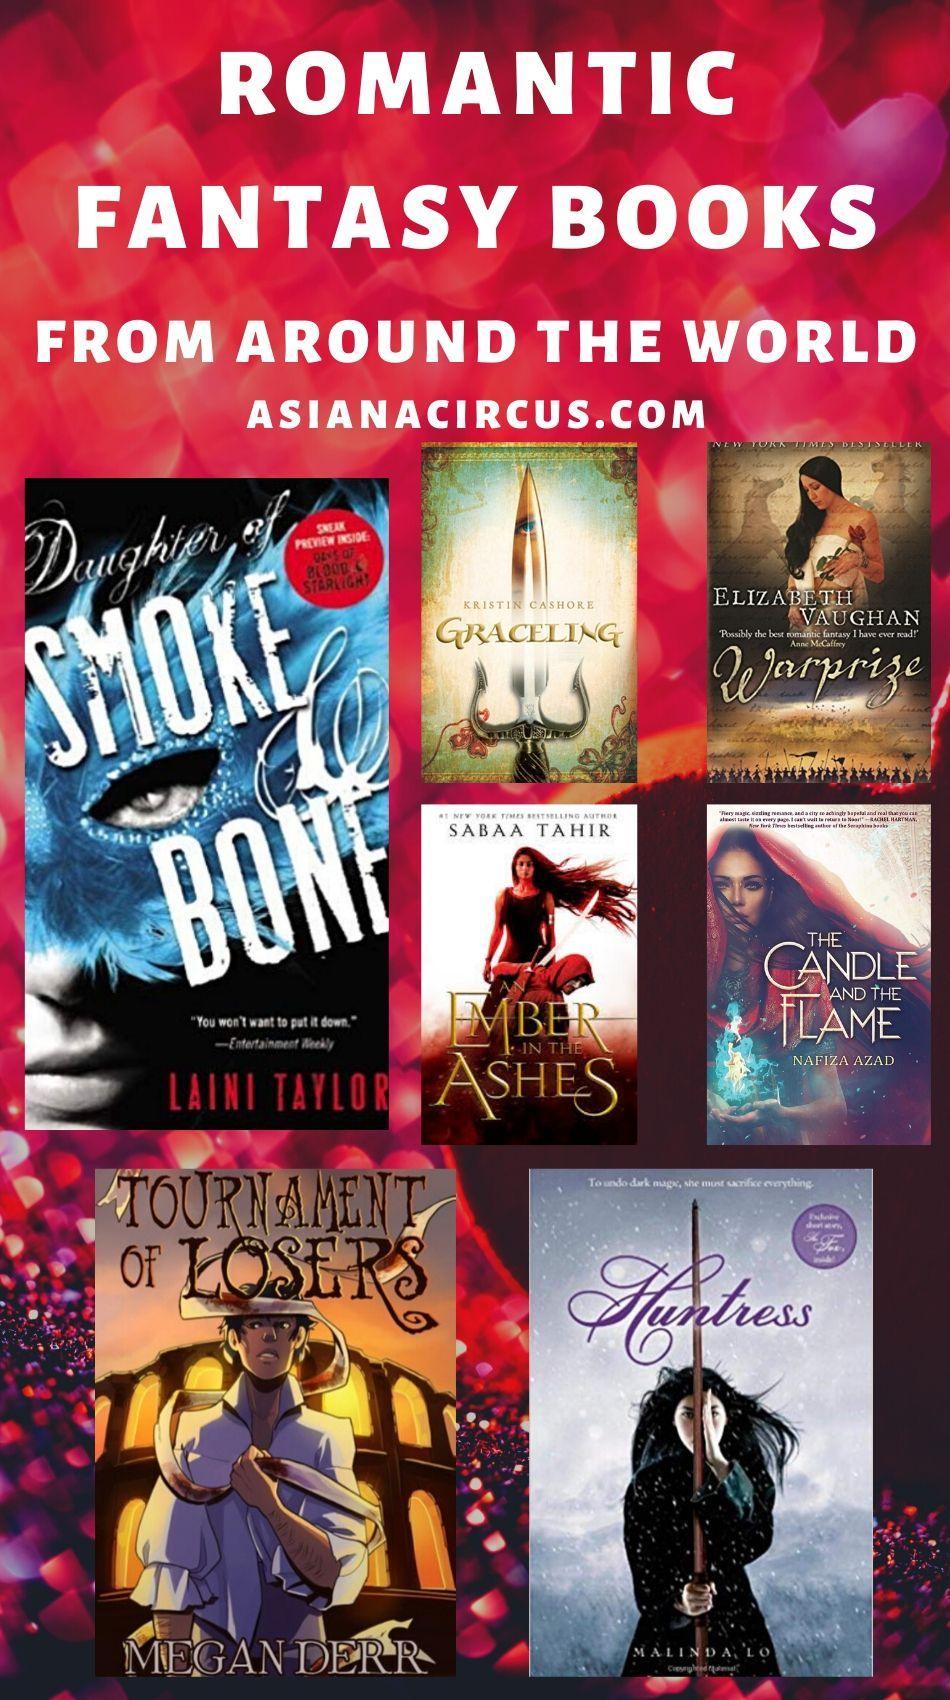 51 Best Romance Fantasy Books Novels To Read 2020 Asiana Circus In 2020 Romantic Fantasy Book Romantic Fantasy Fantasy Book Series